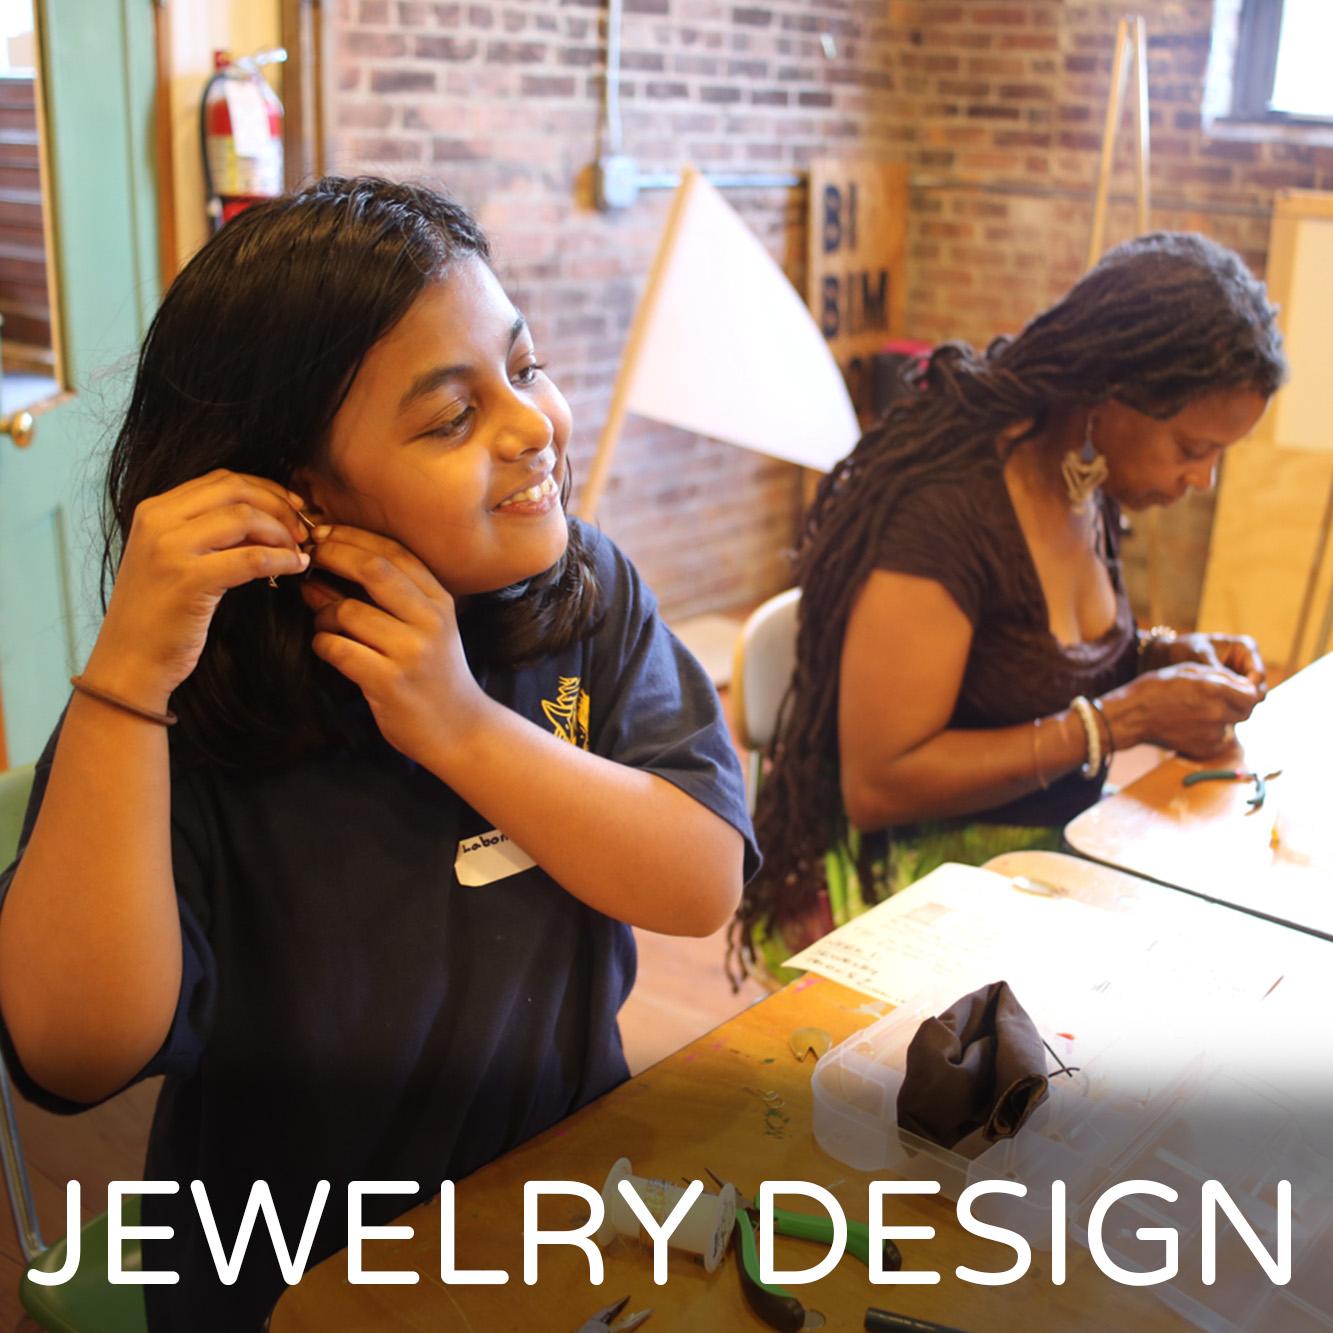 JewelryDesign.jpg